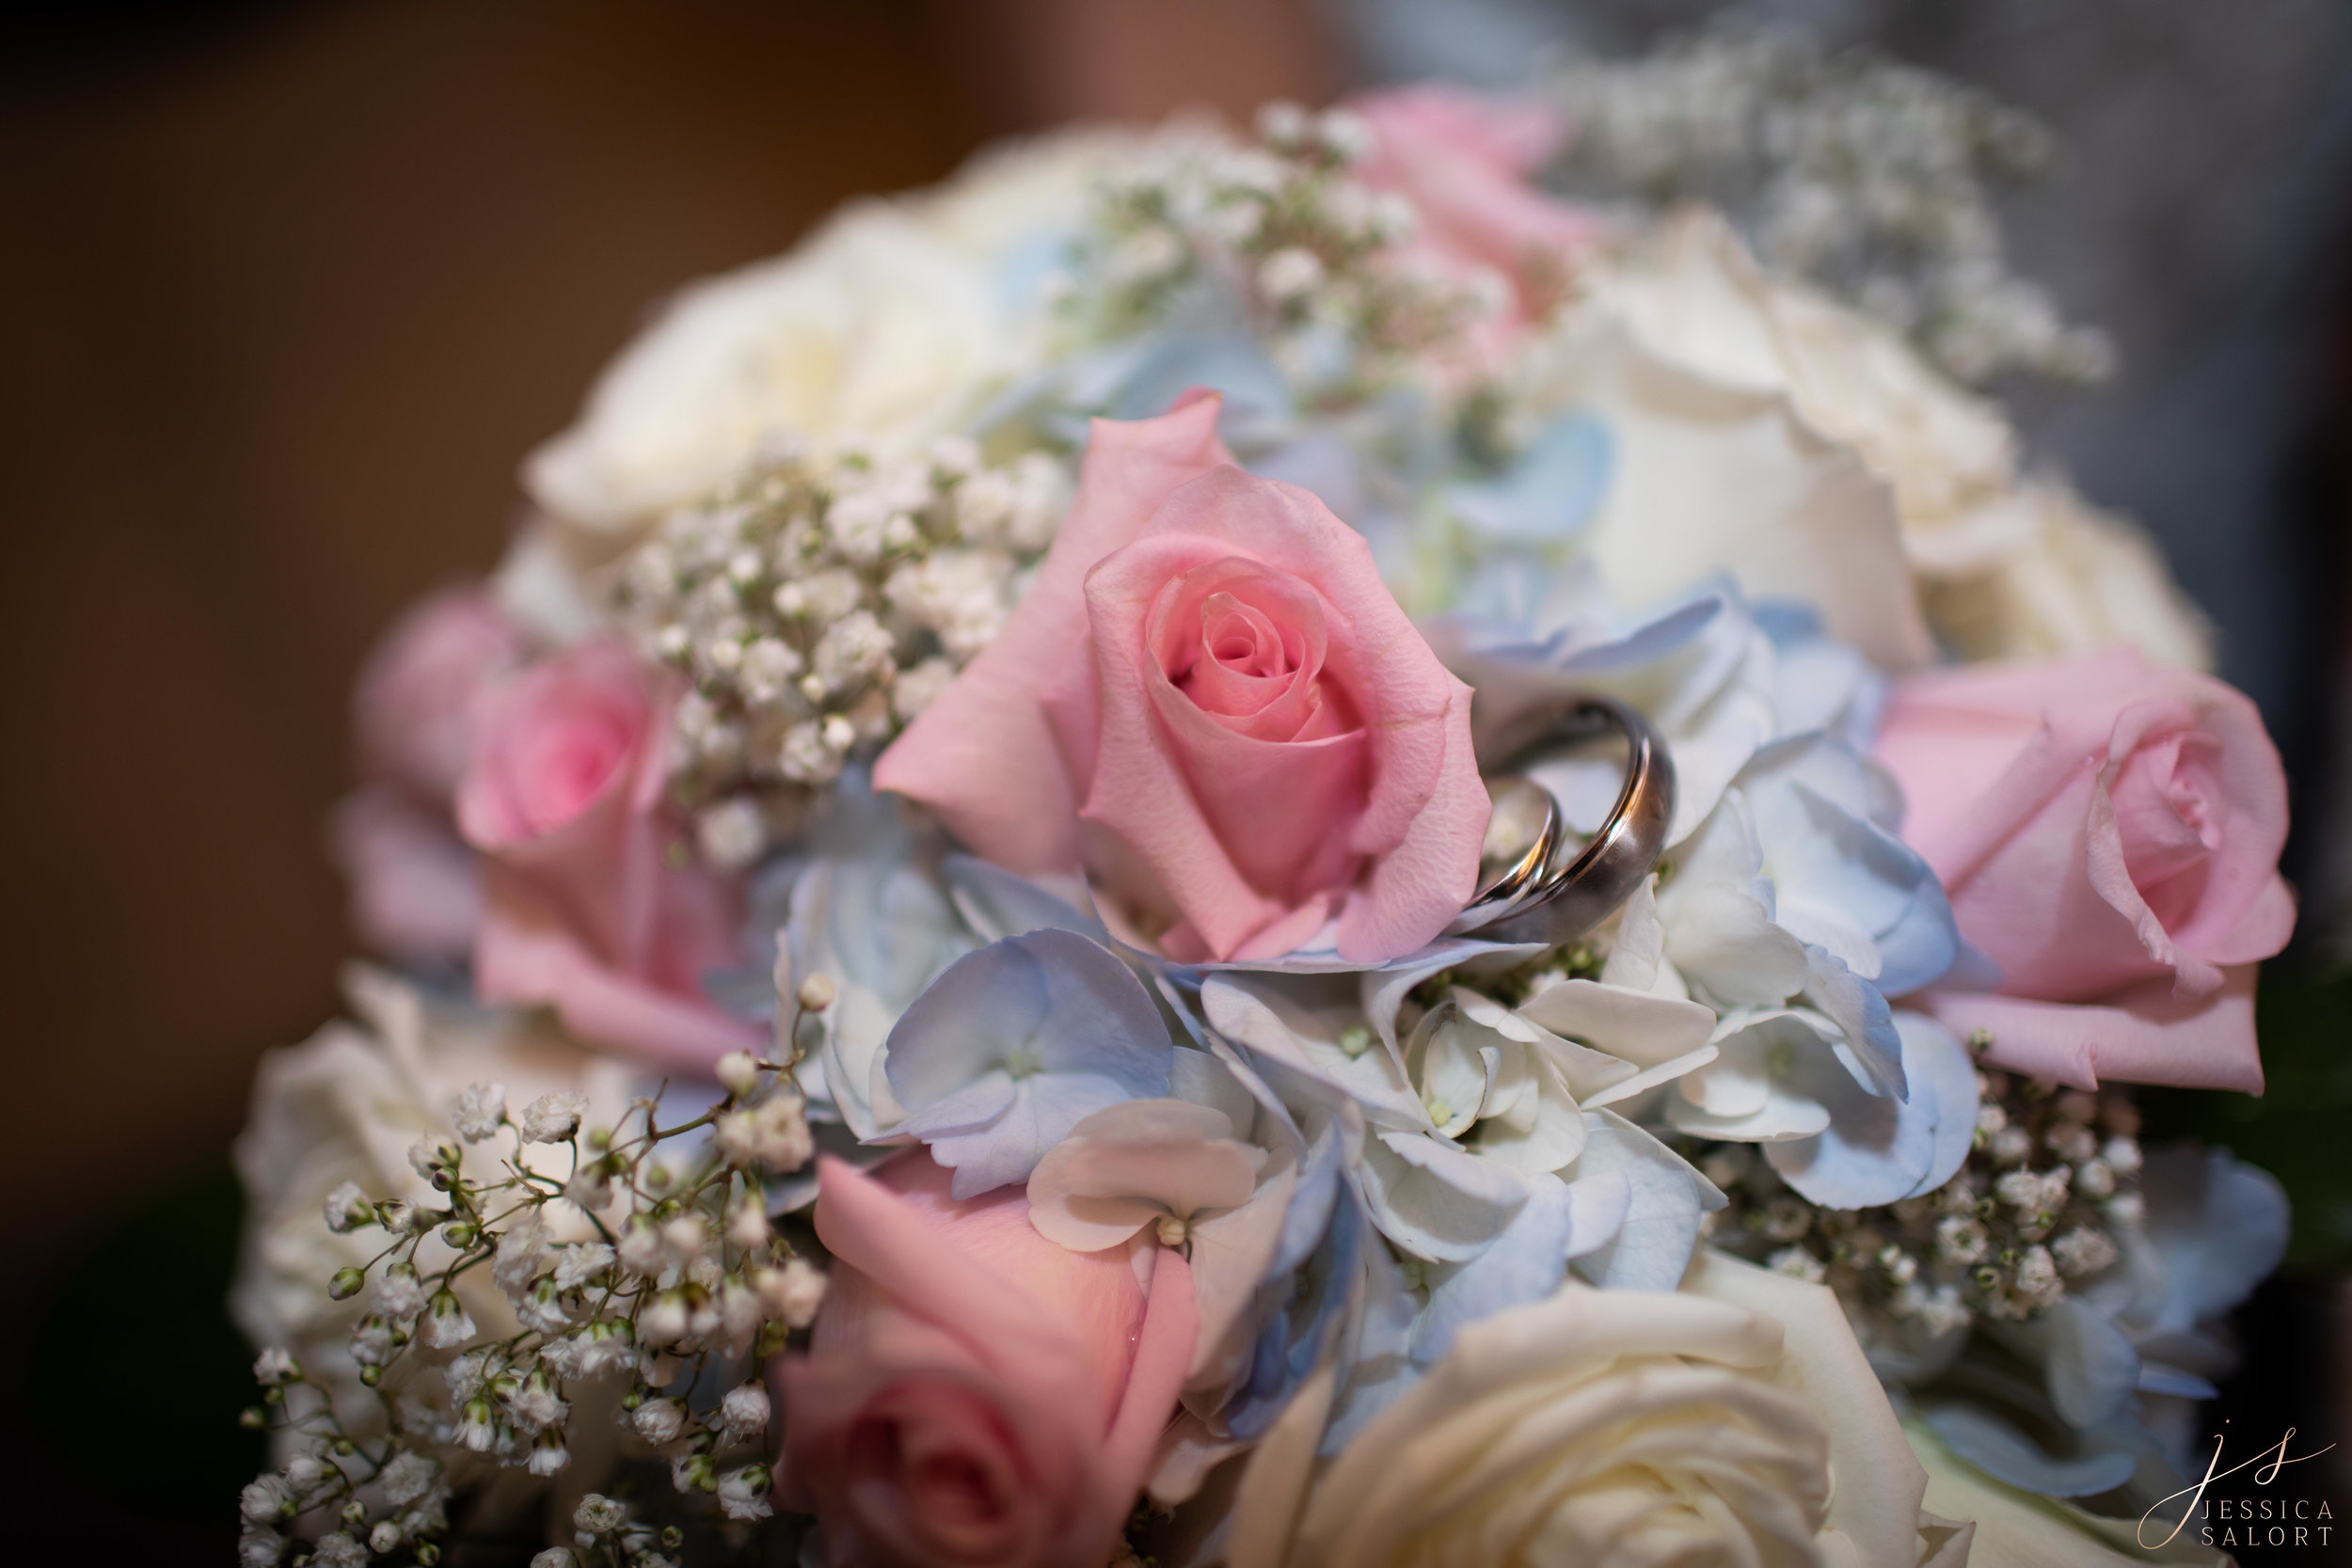 Jessica Salort, Wedding Photographer